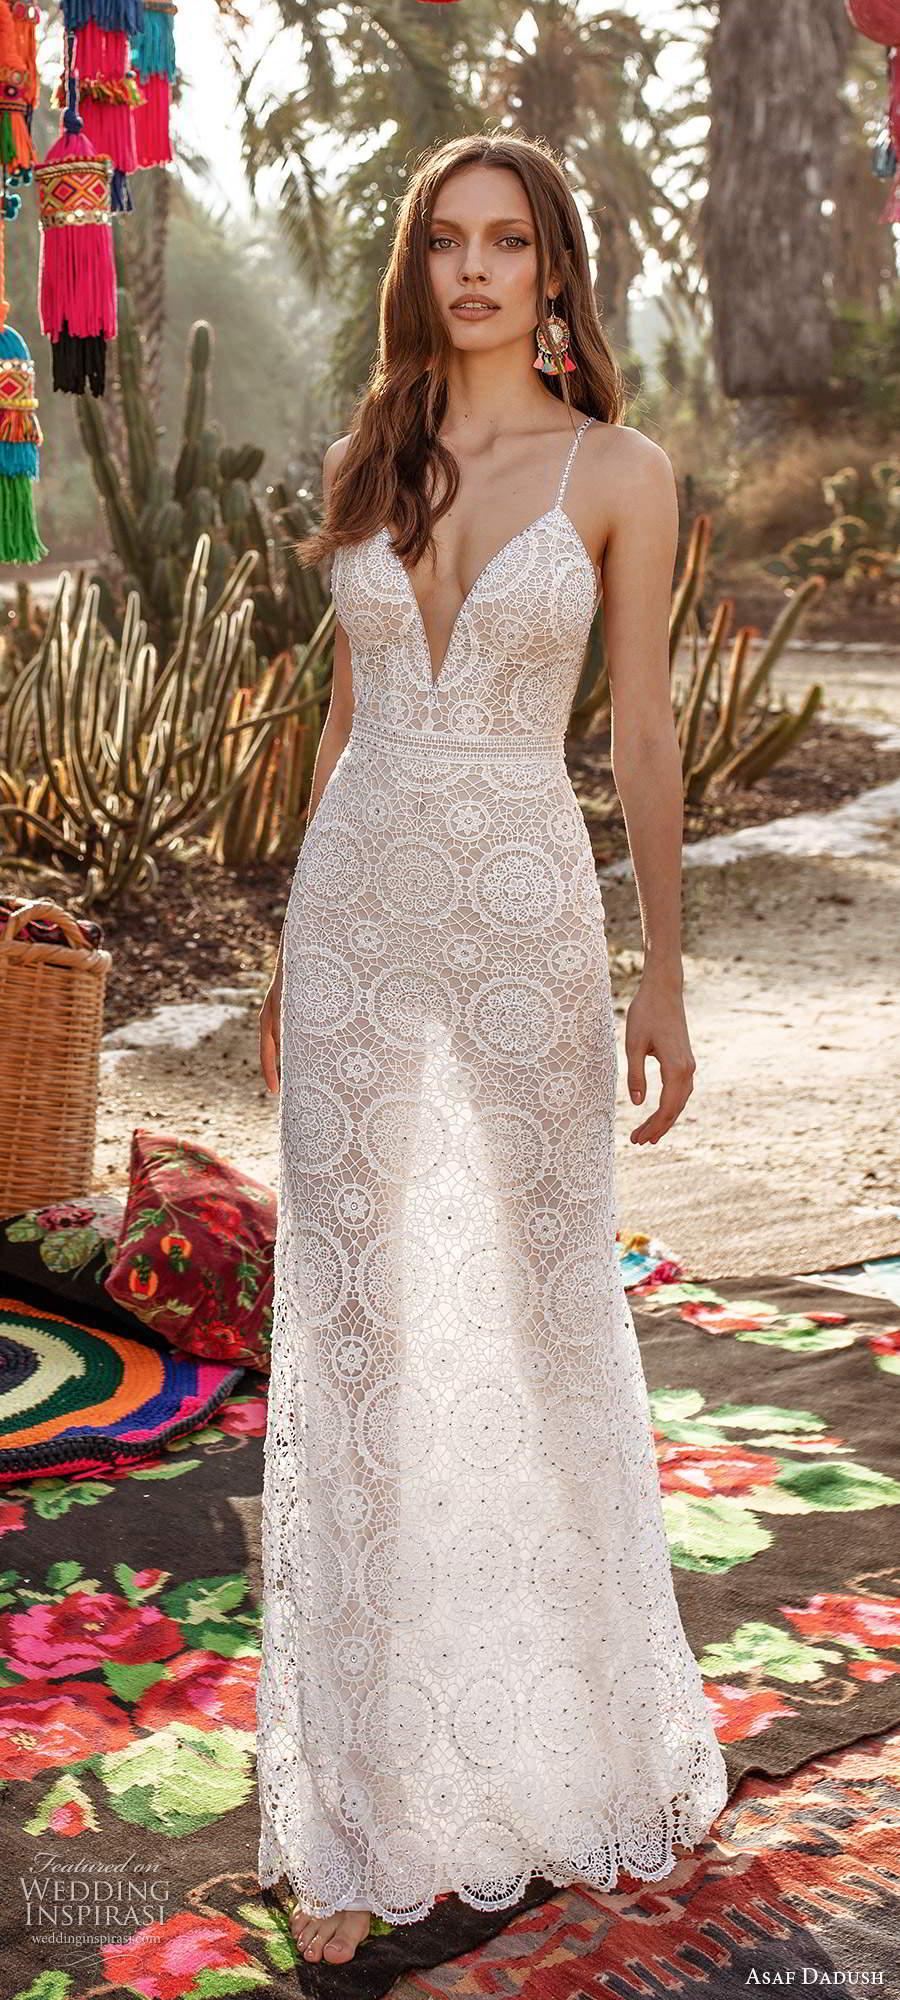 asaf dadush 2020 bridal sleeveless thin beaded straps plunging neckline fully embellished lace sheath side cutout a line wedding dress sheer open back (5) mv